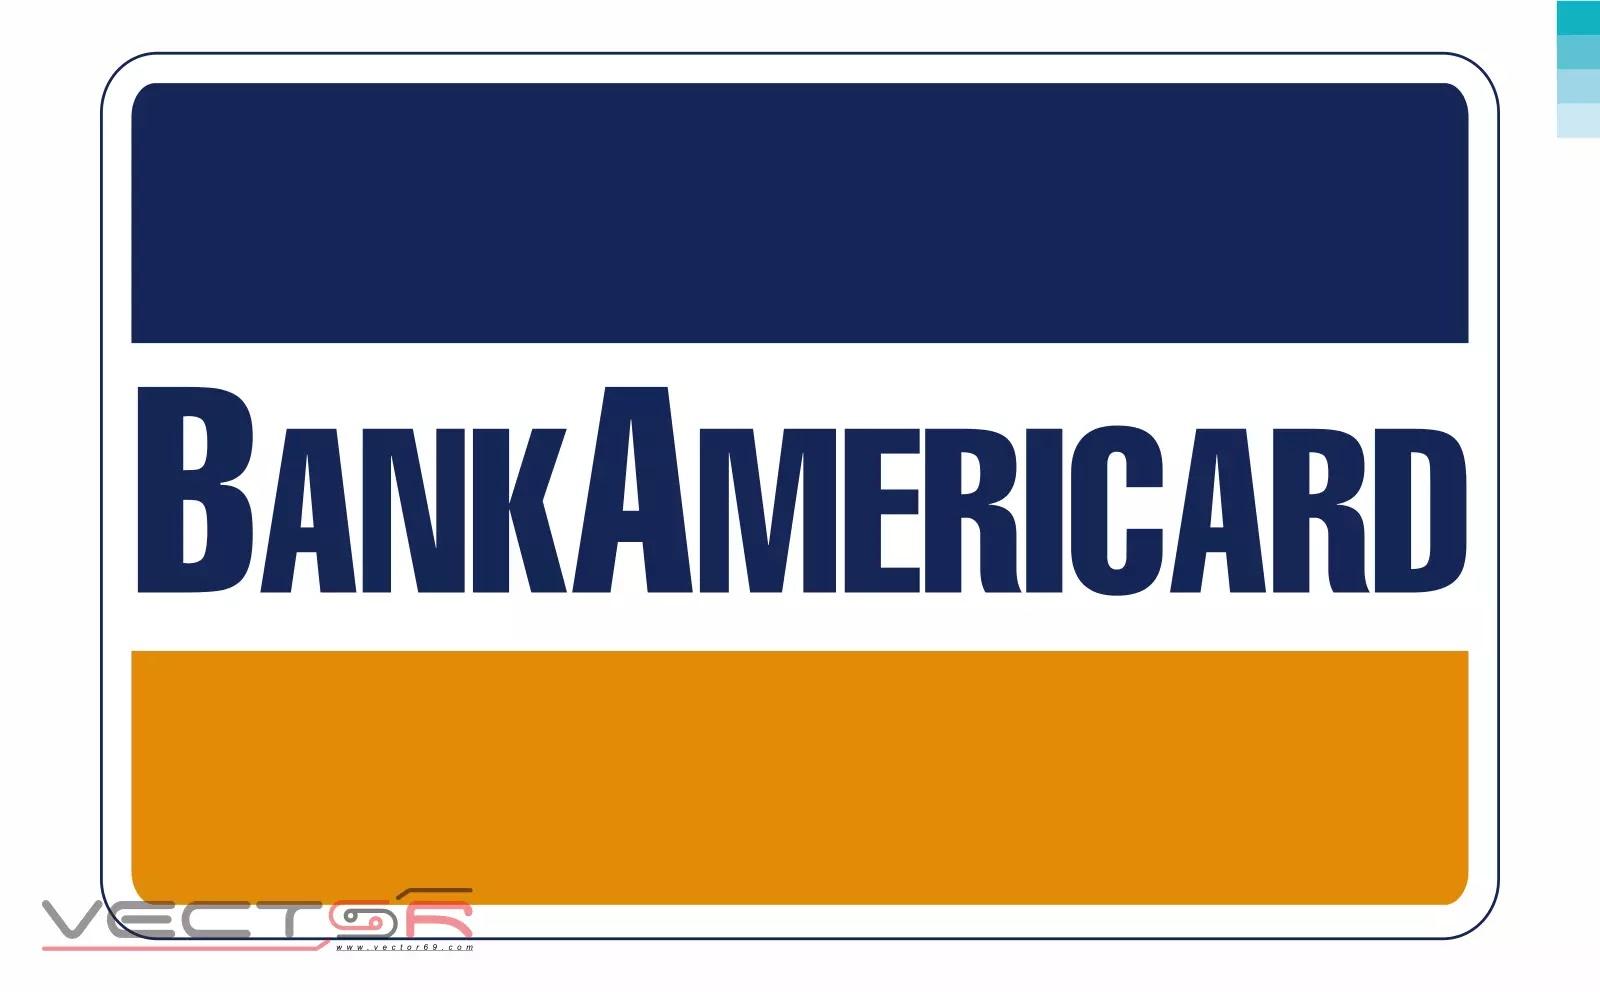 BankAmericard Logo - Download Vector File SVG (Scalable Vector Graphics)